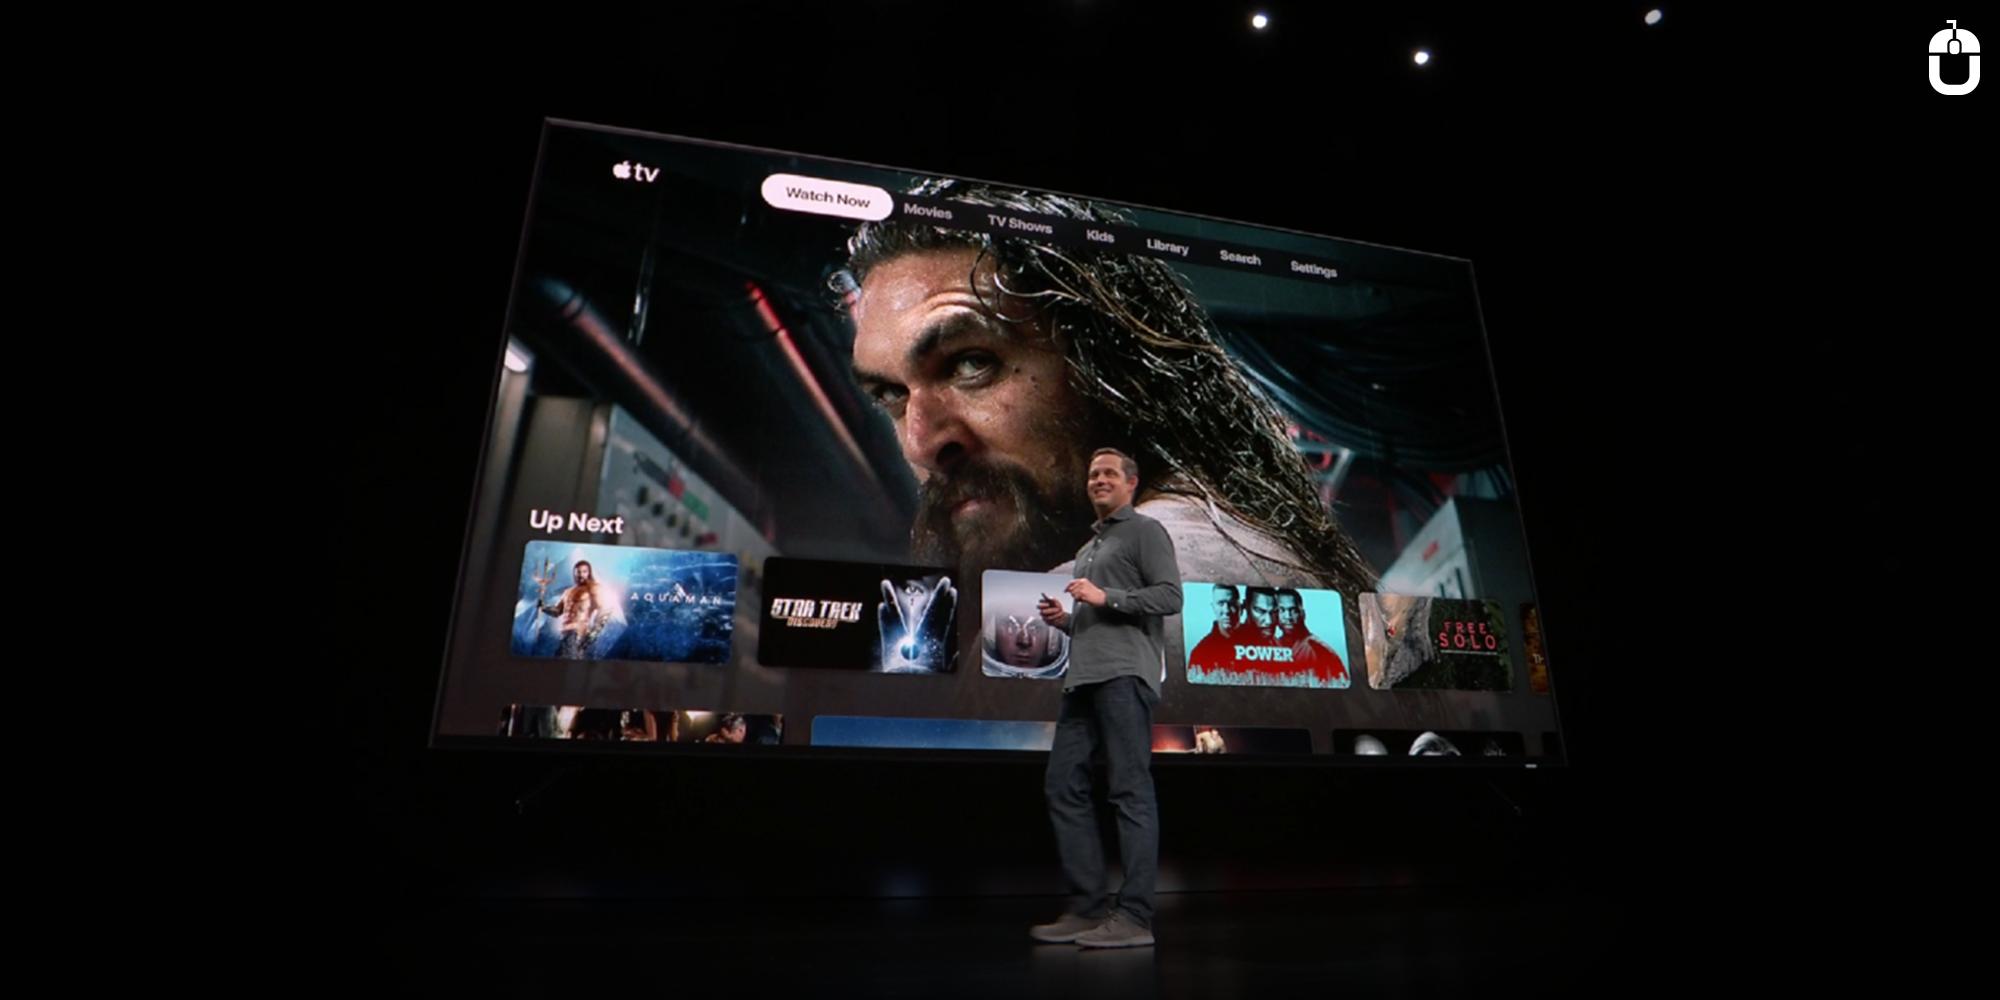 Introduced Apple TV